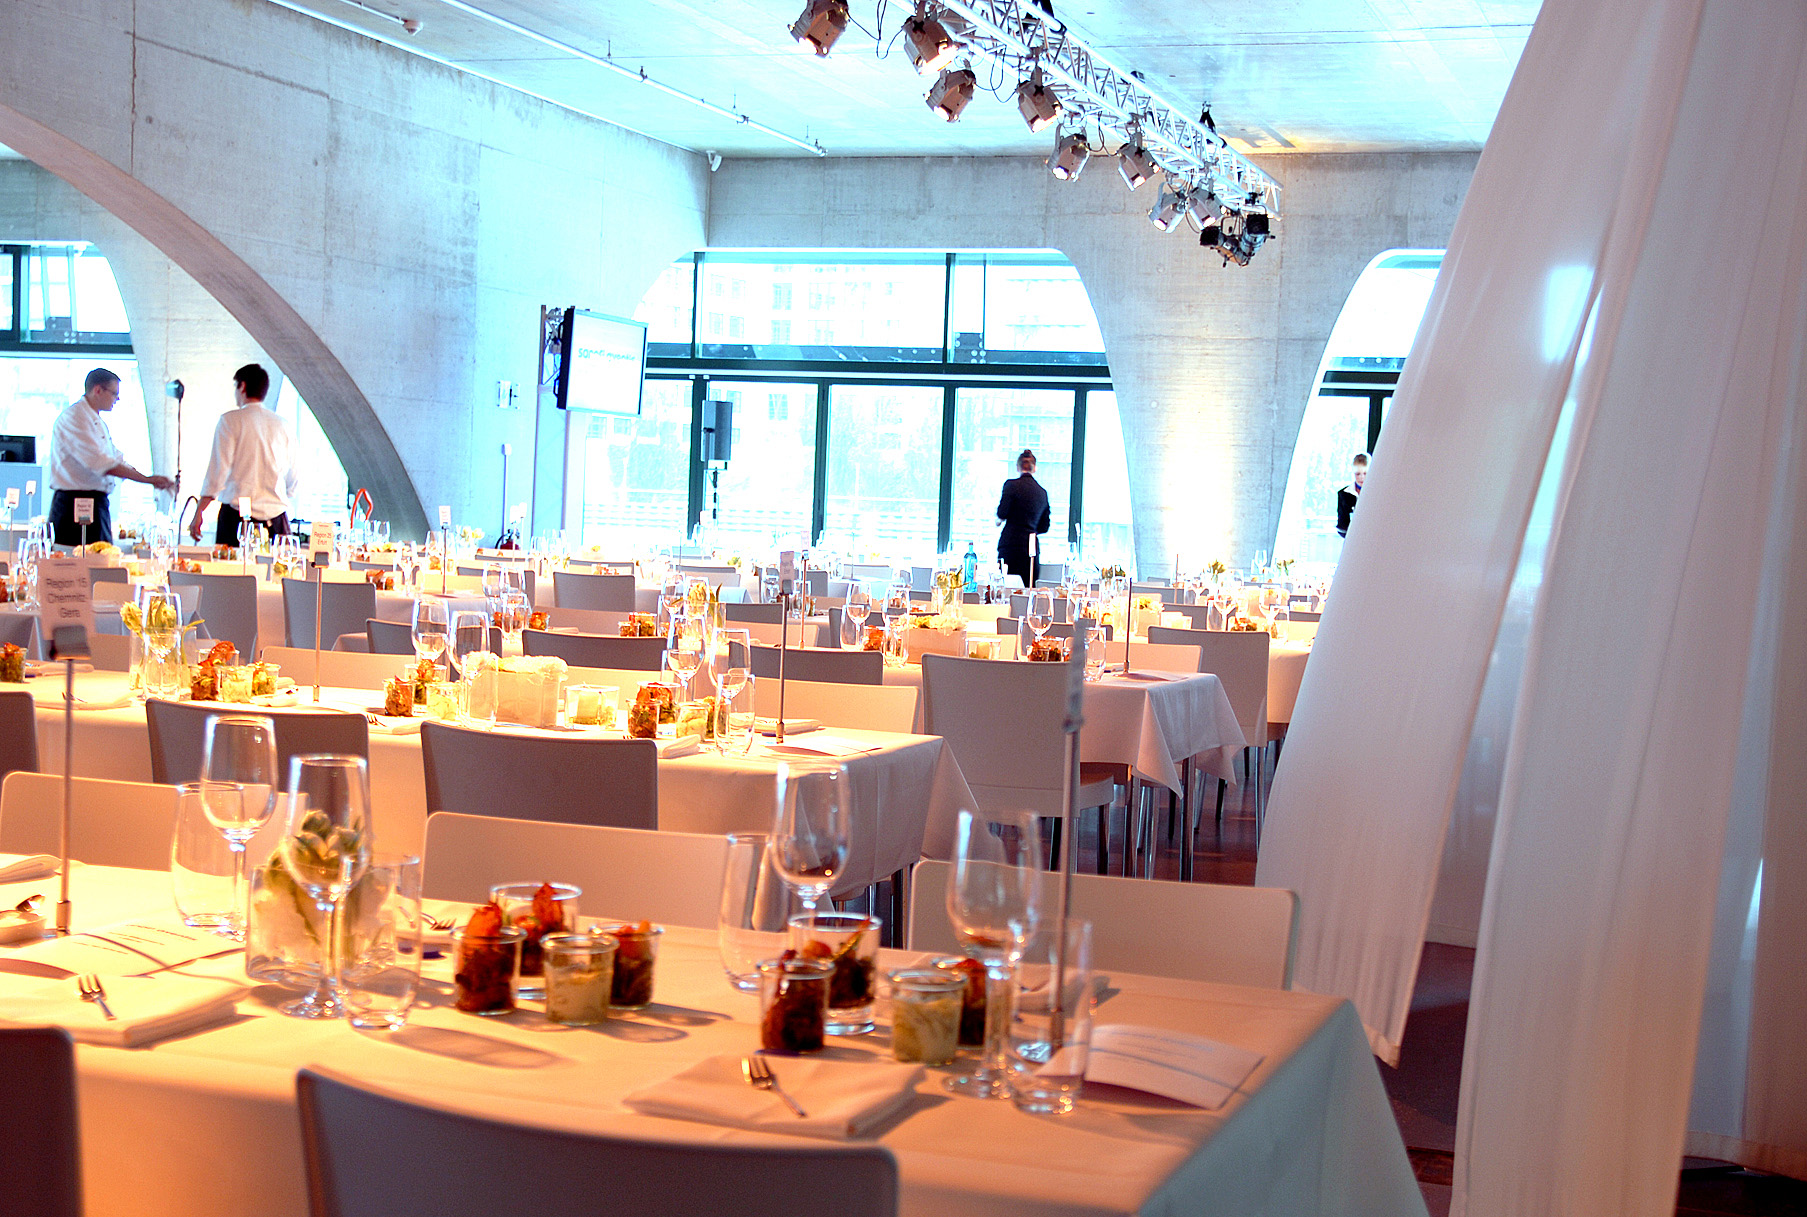 Eventfotografie_Berlin_Cathrin_Bauer_16